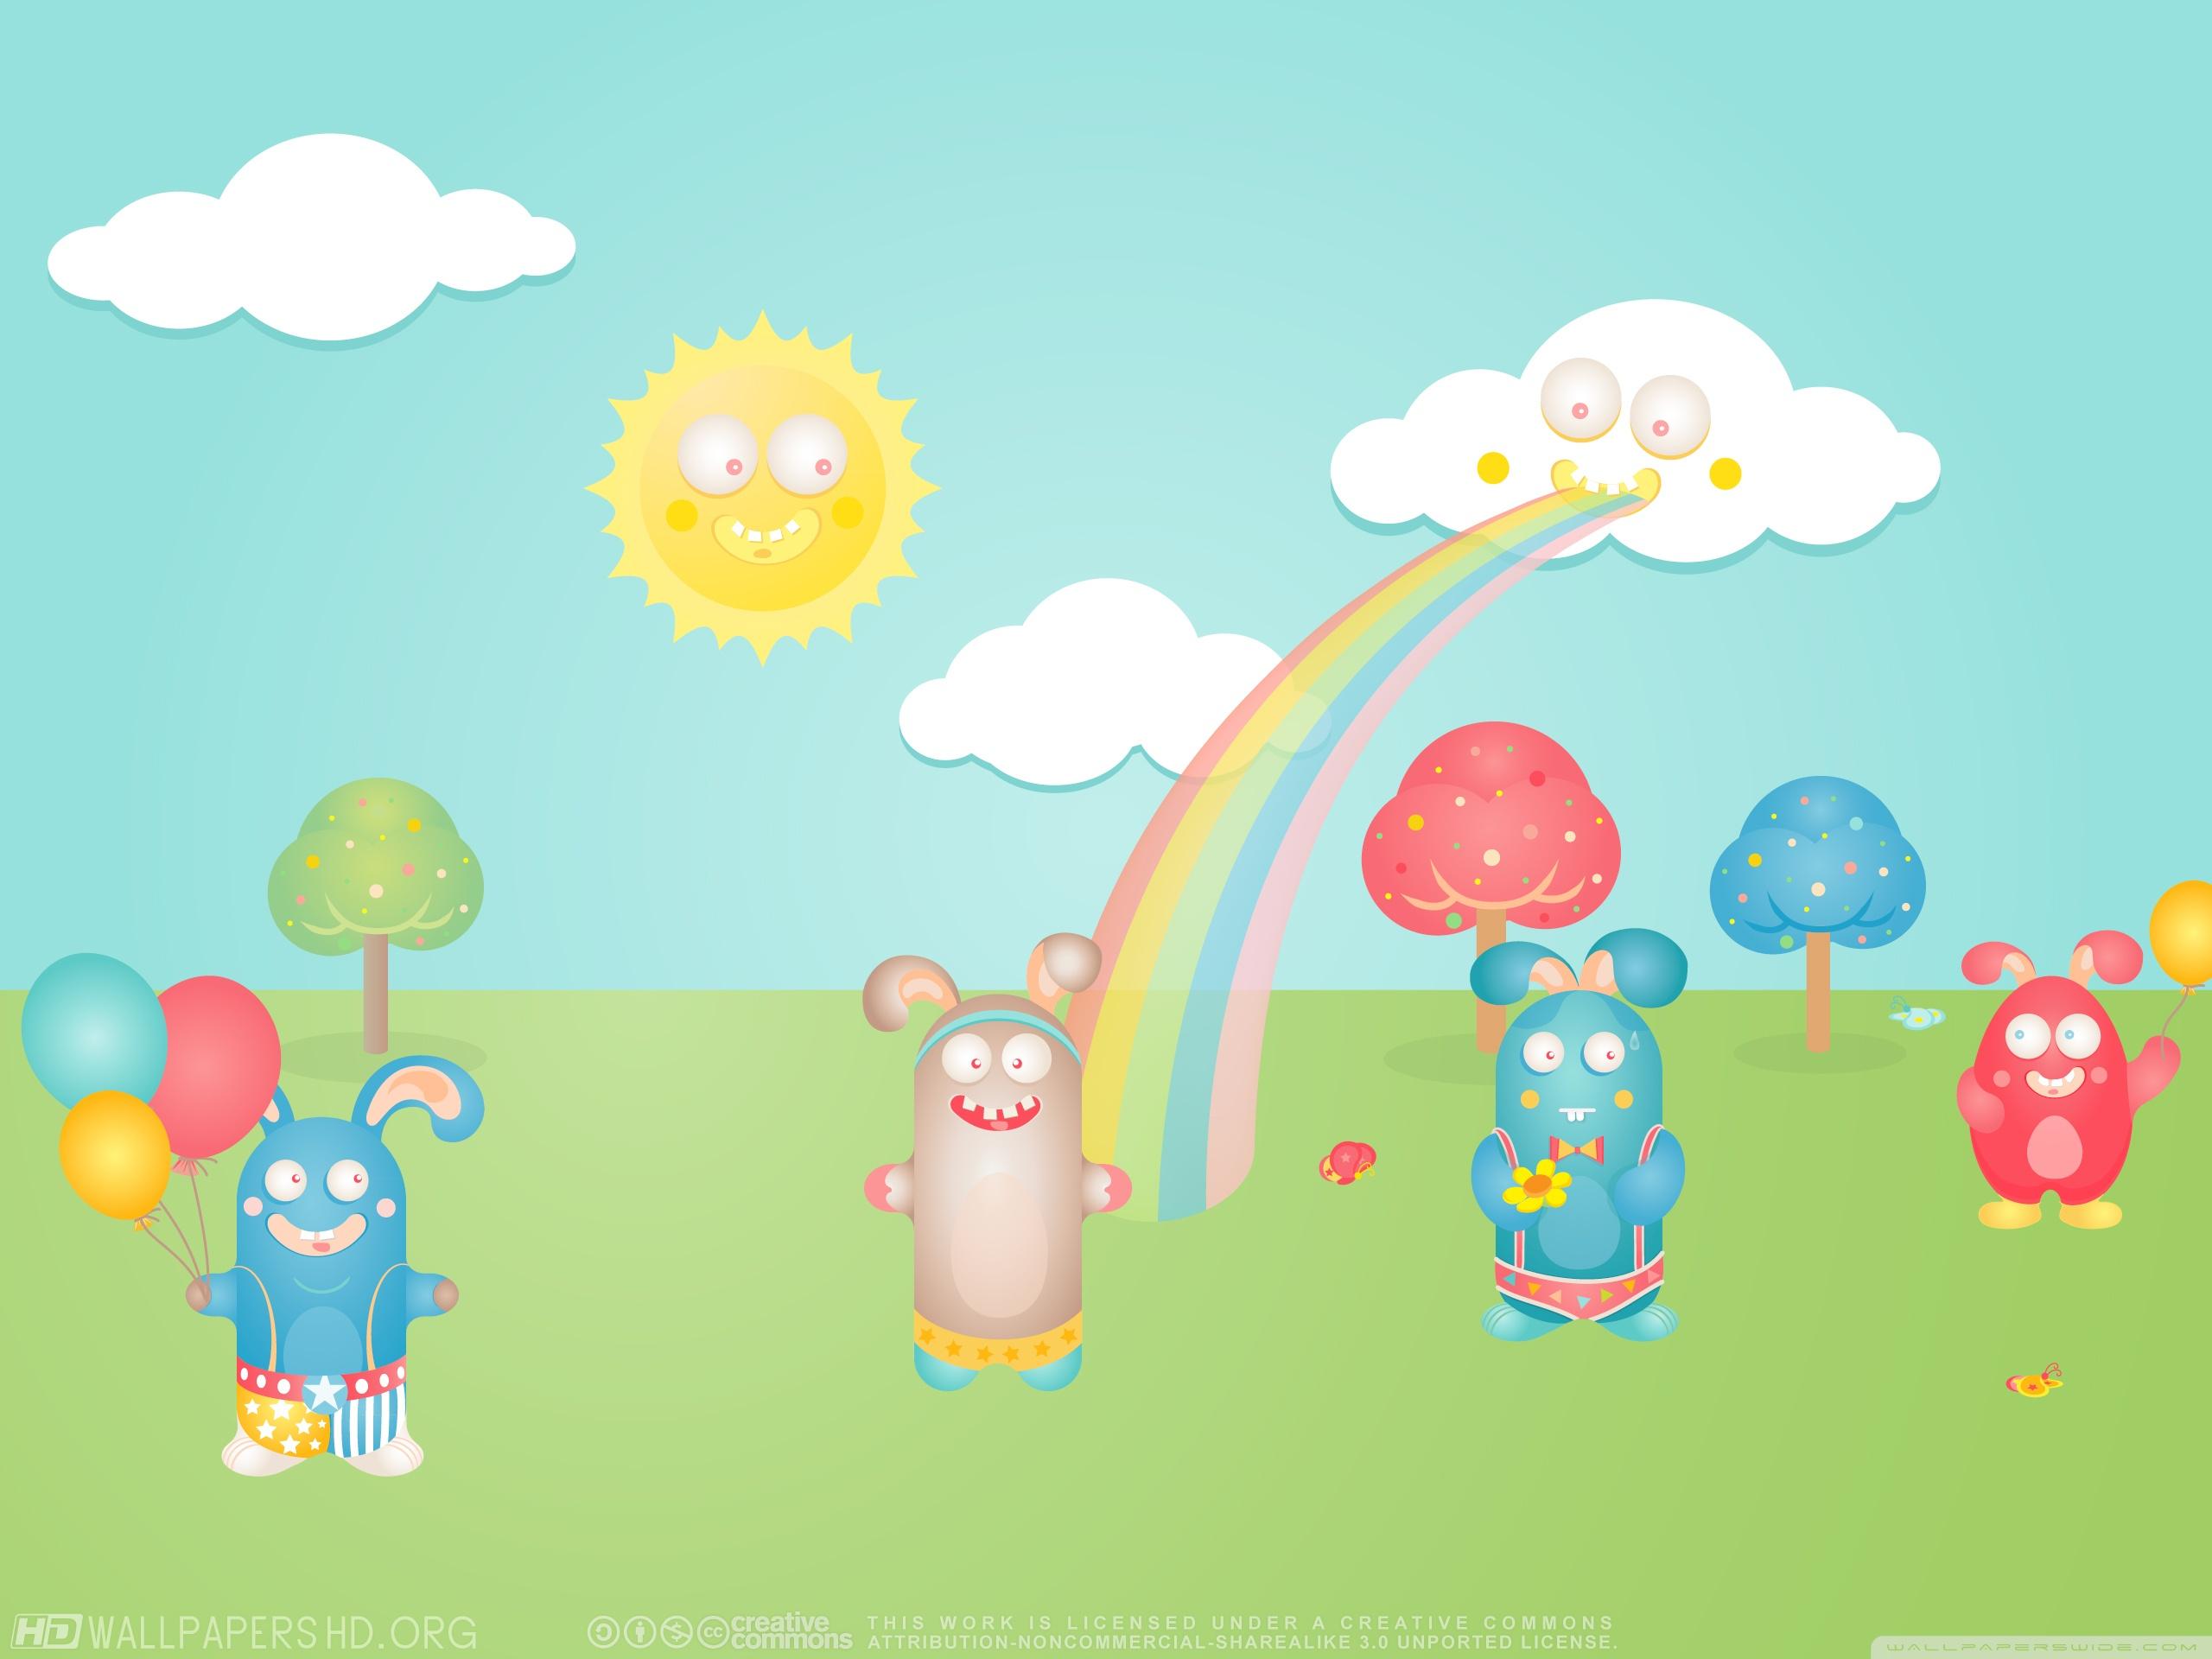 Gambar Kartun Kelinci Pelangi - HD Wallpaper